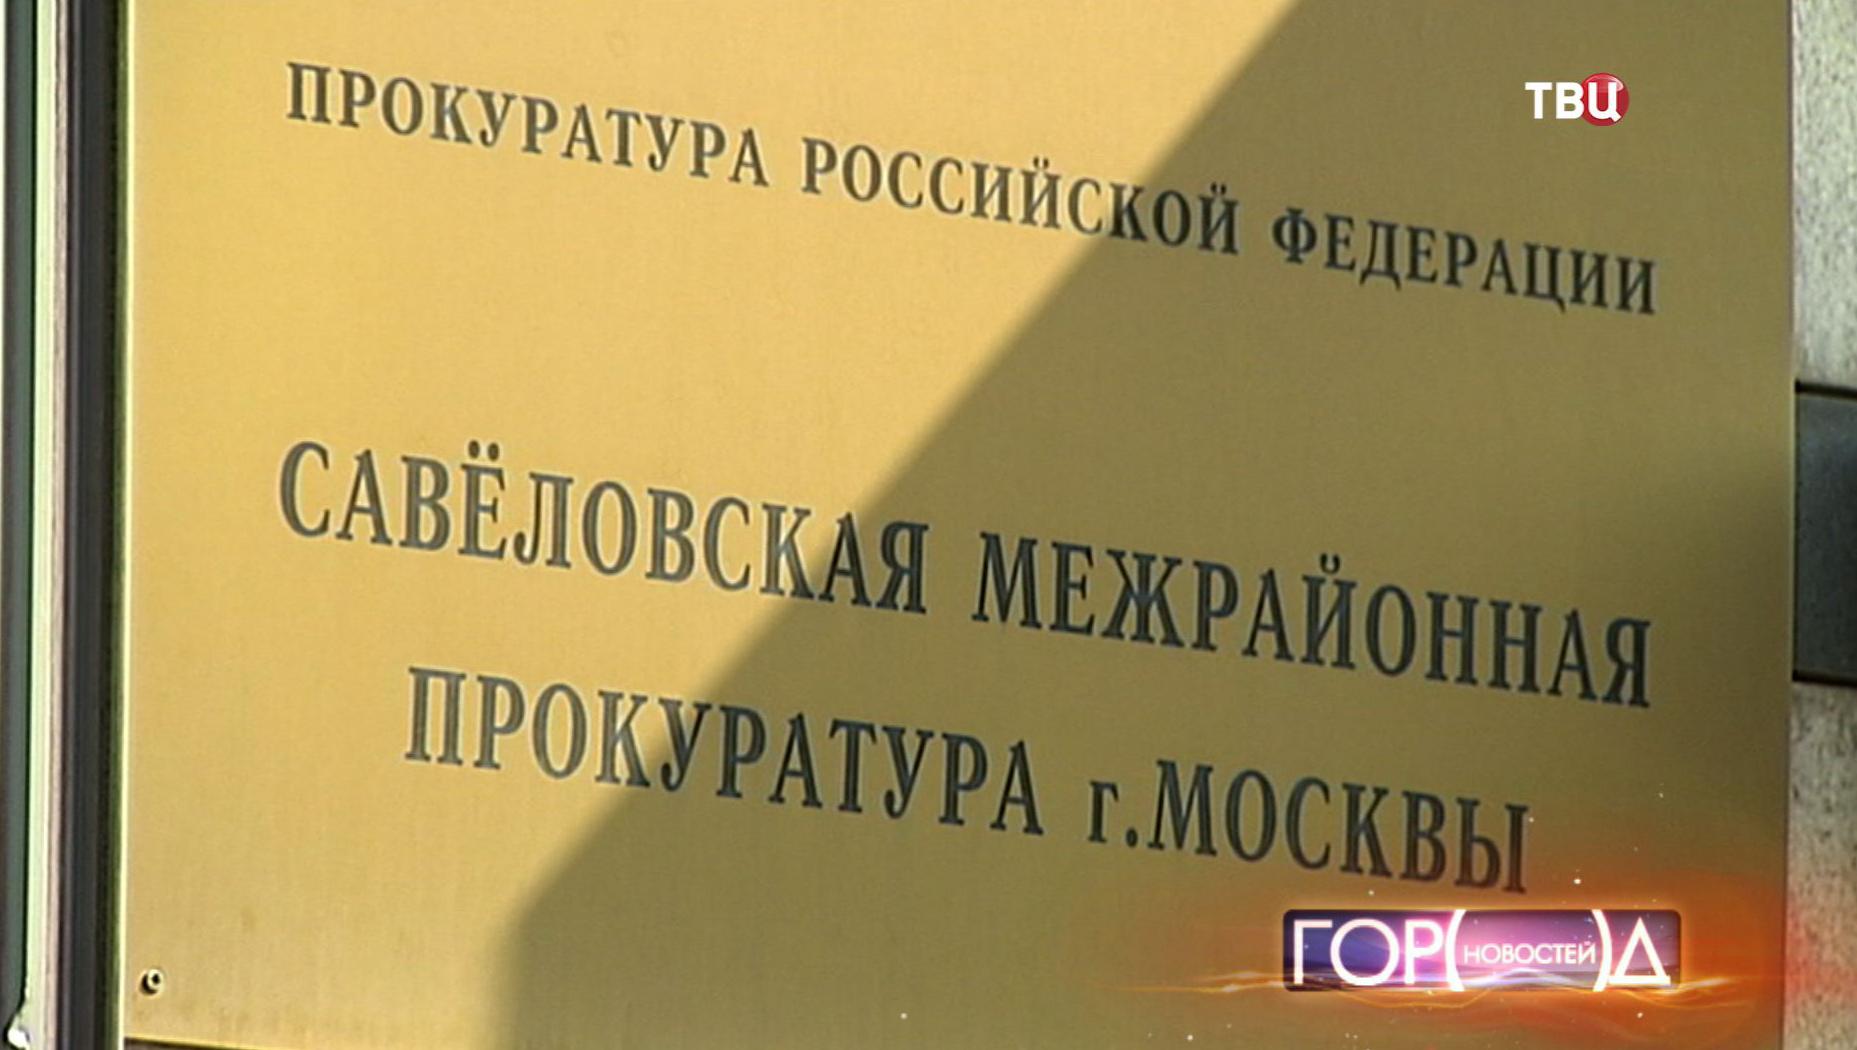 Савеловская межрайонная прокуратура г. Москвы